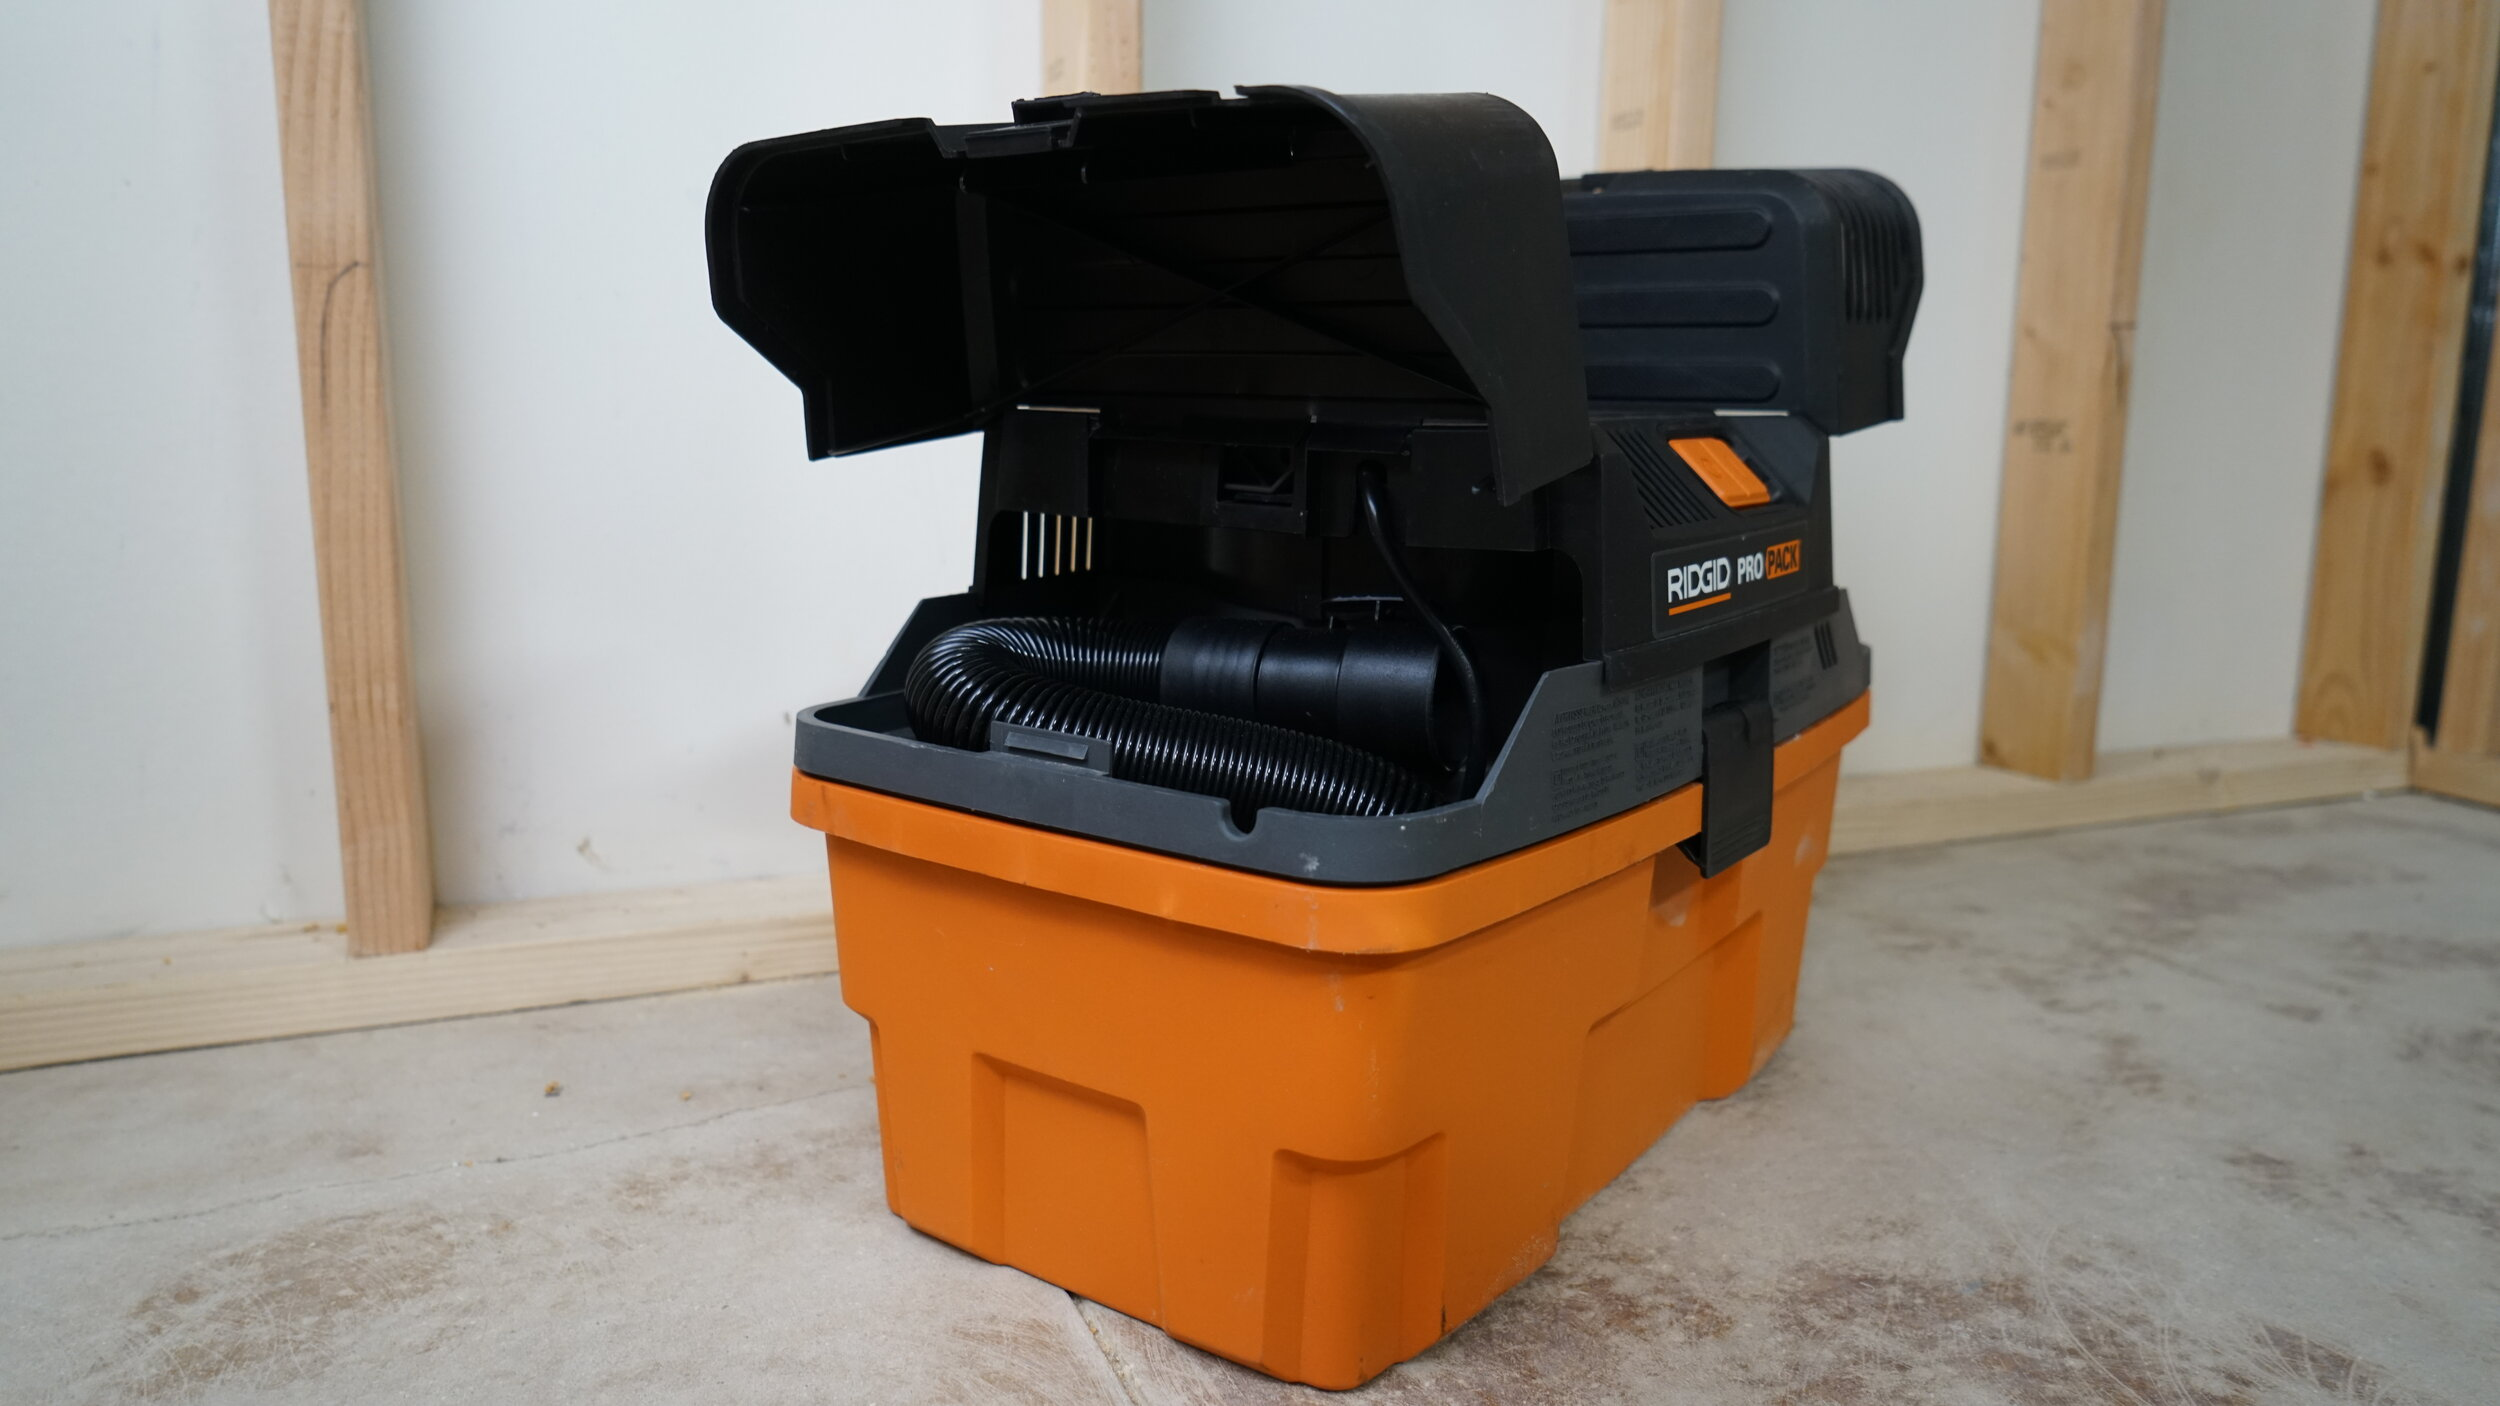 ridgid-wet-vac-5hp-portable.JPG